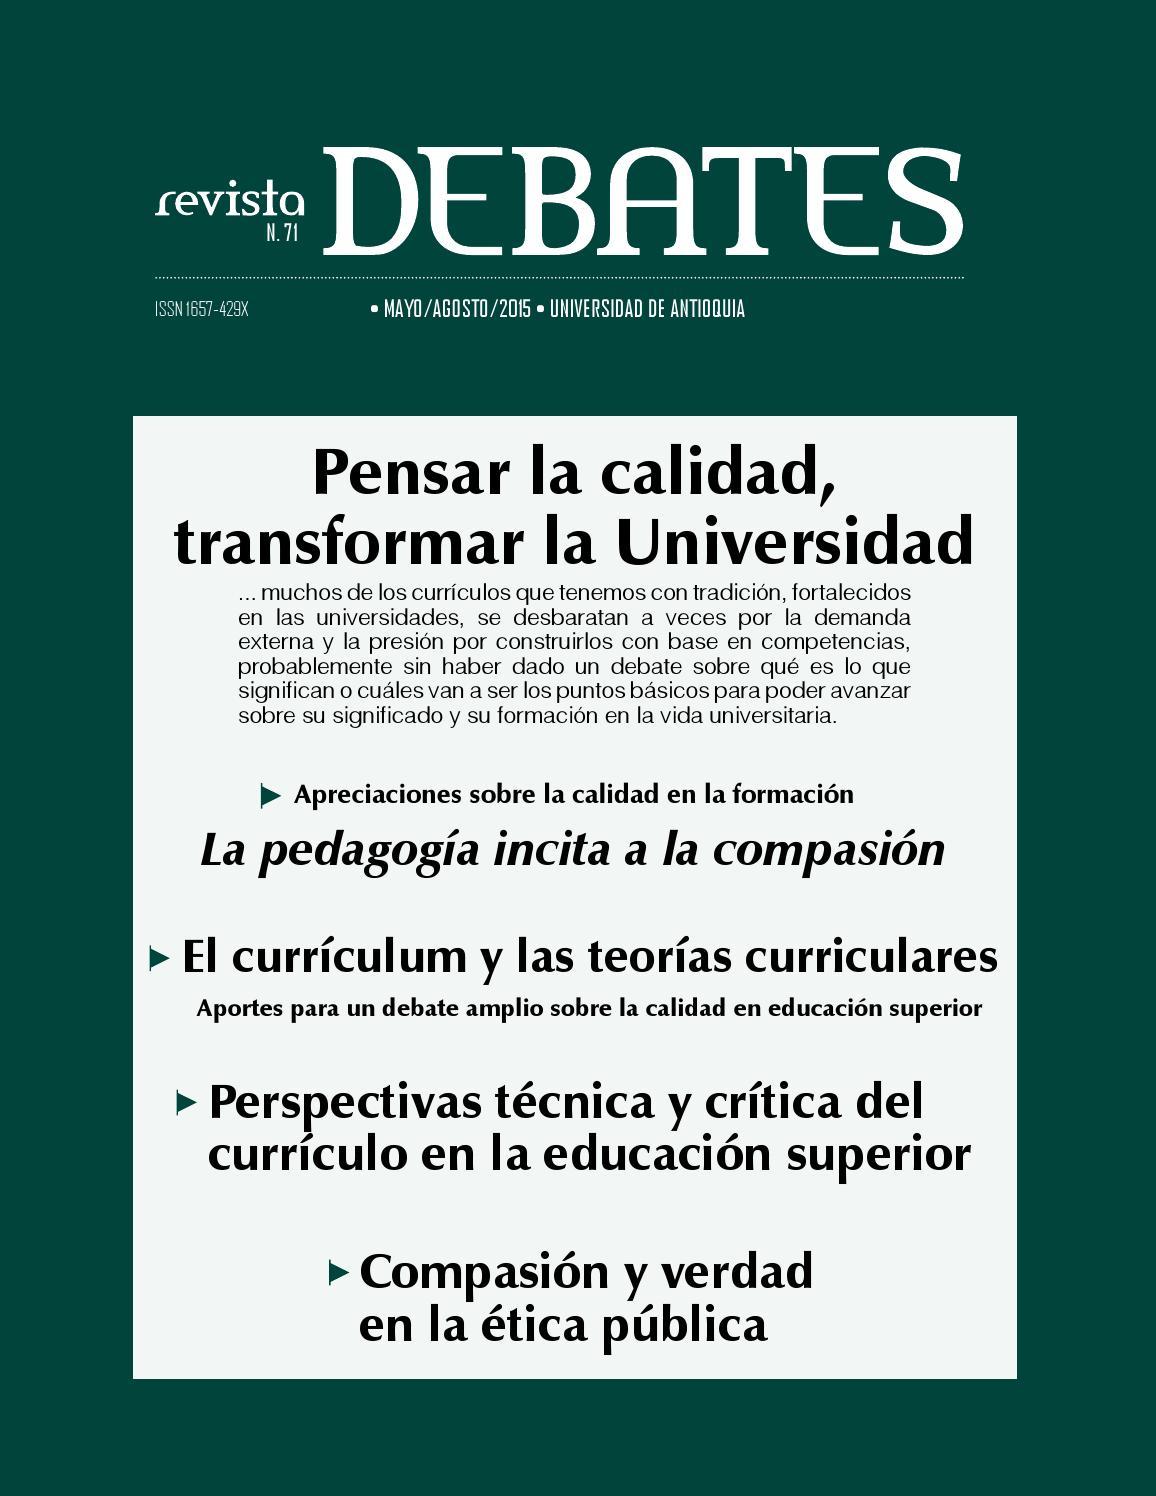 Debates 71 by Universidad de Antioquia - issuu